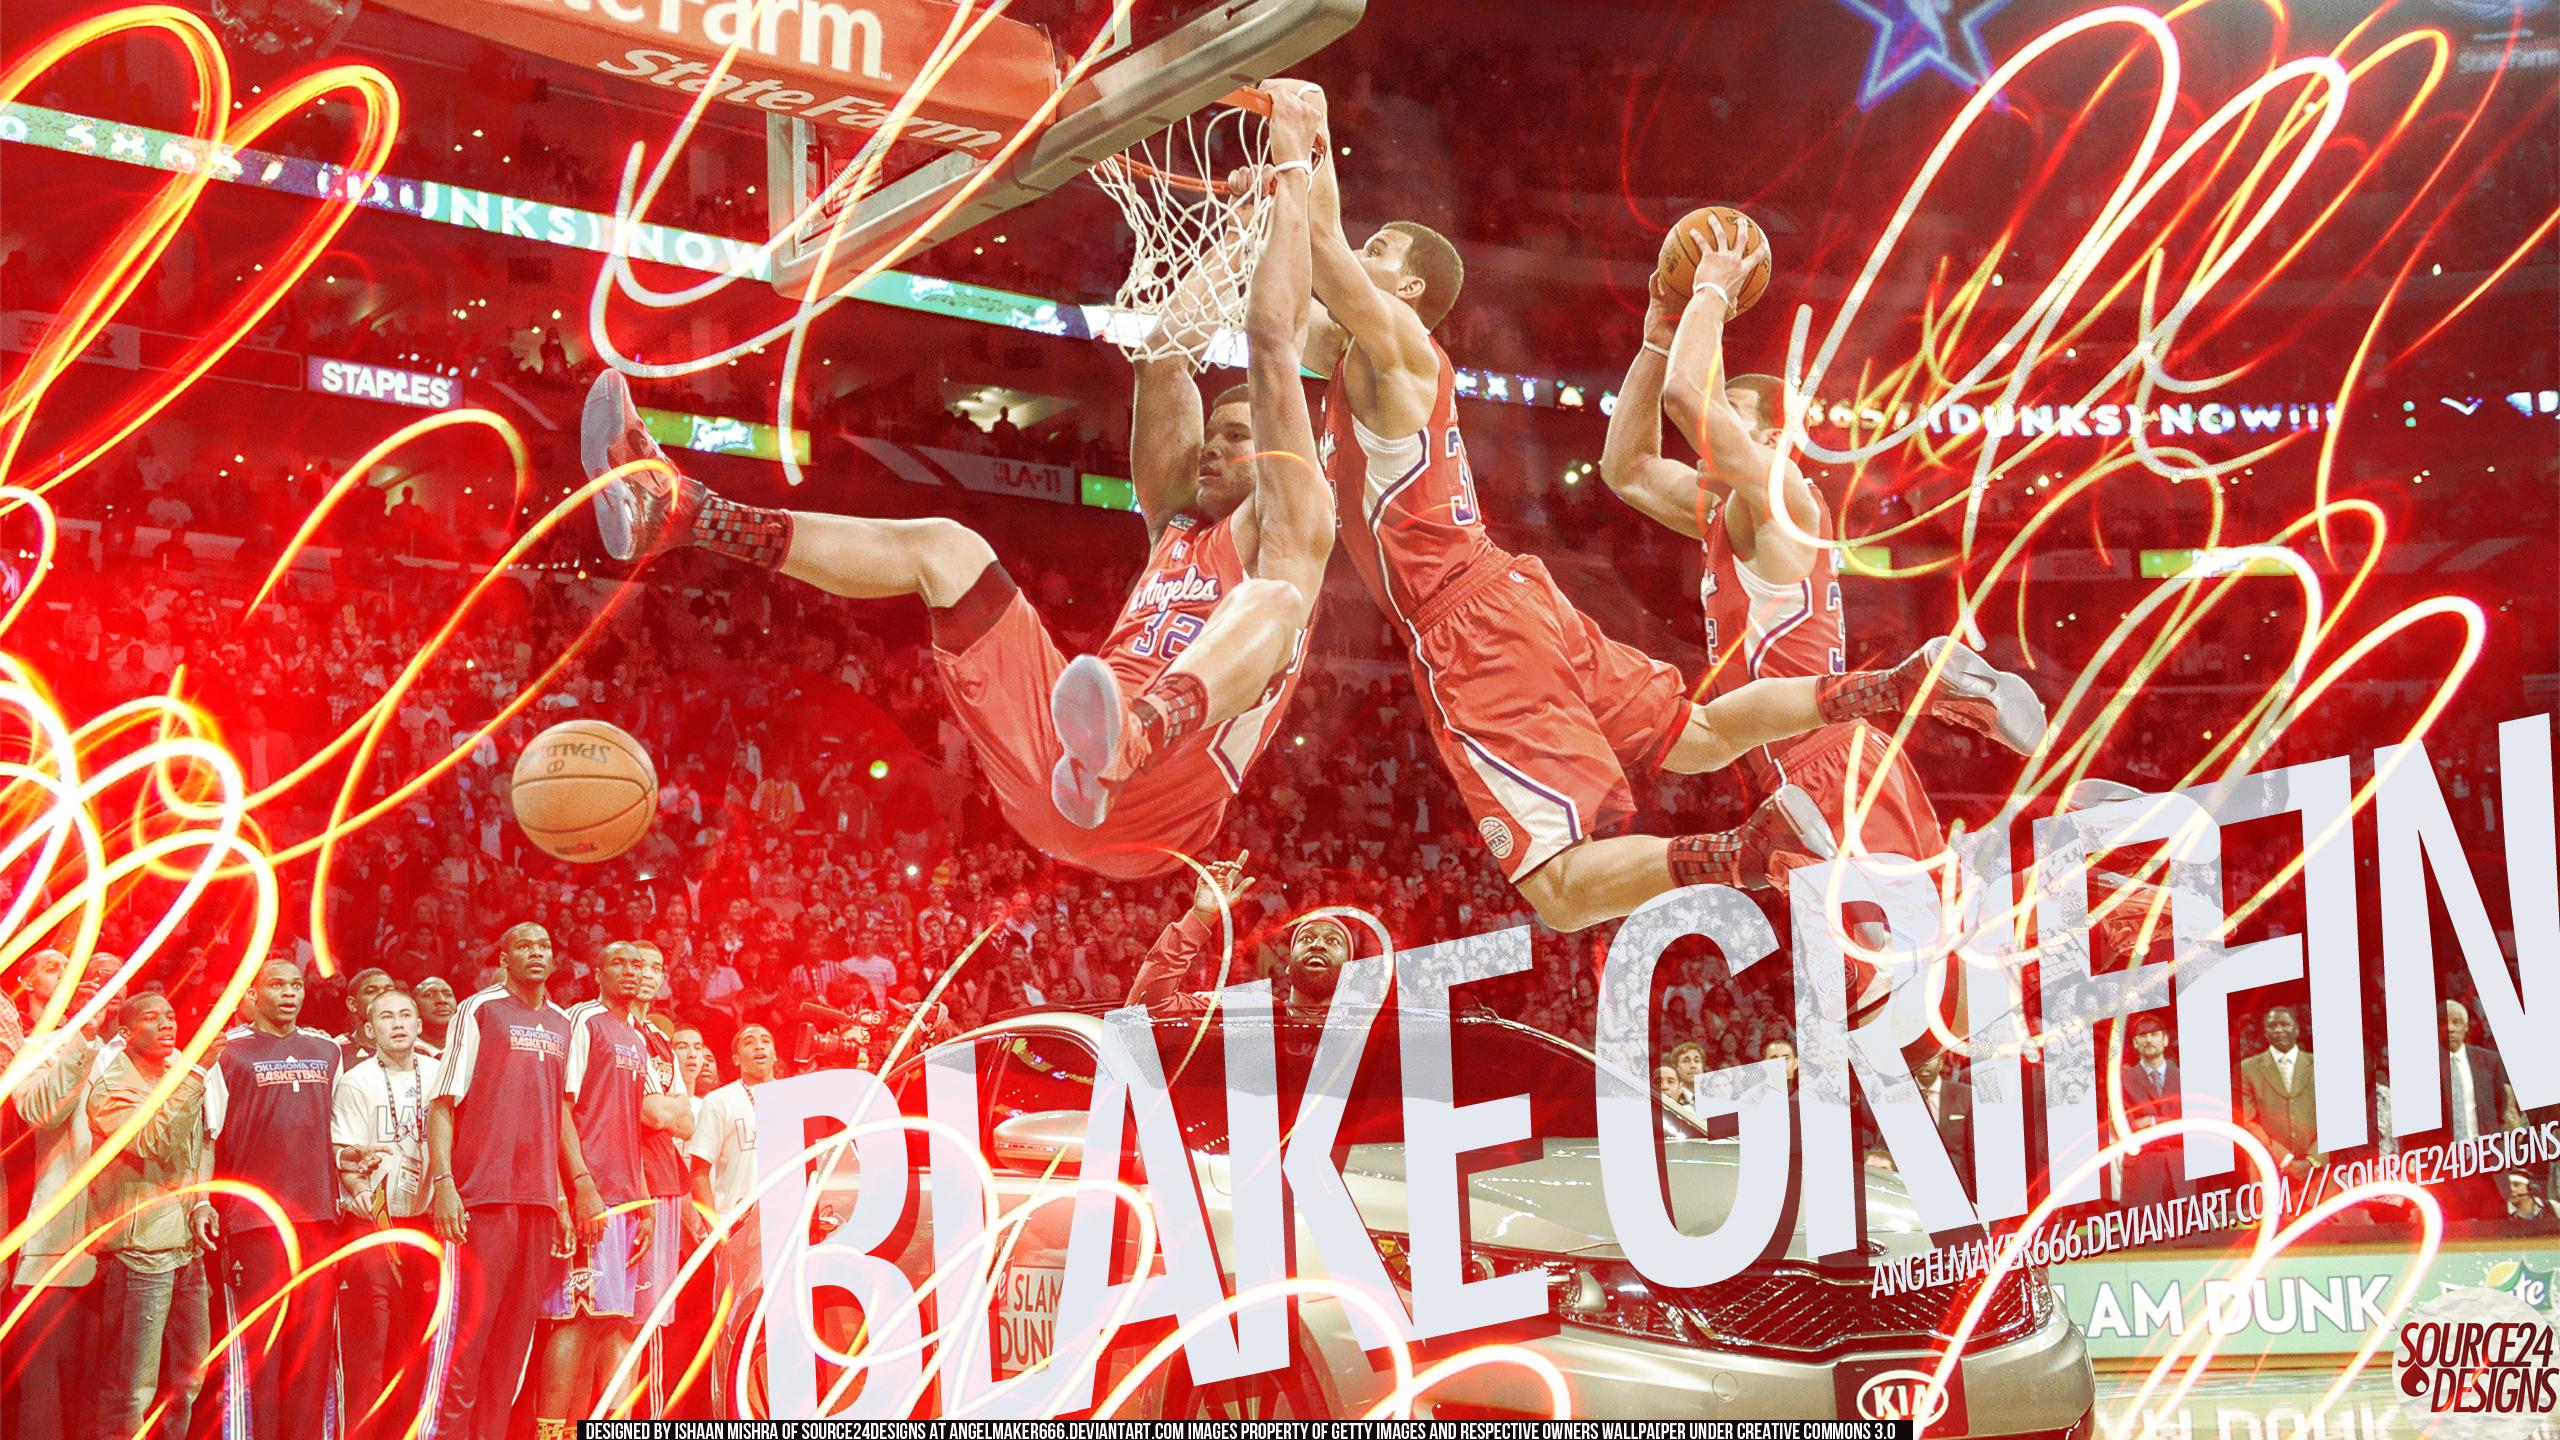 blake griffin wallpaper nike - photo #5